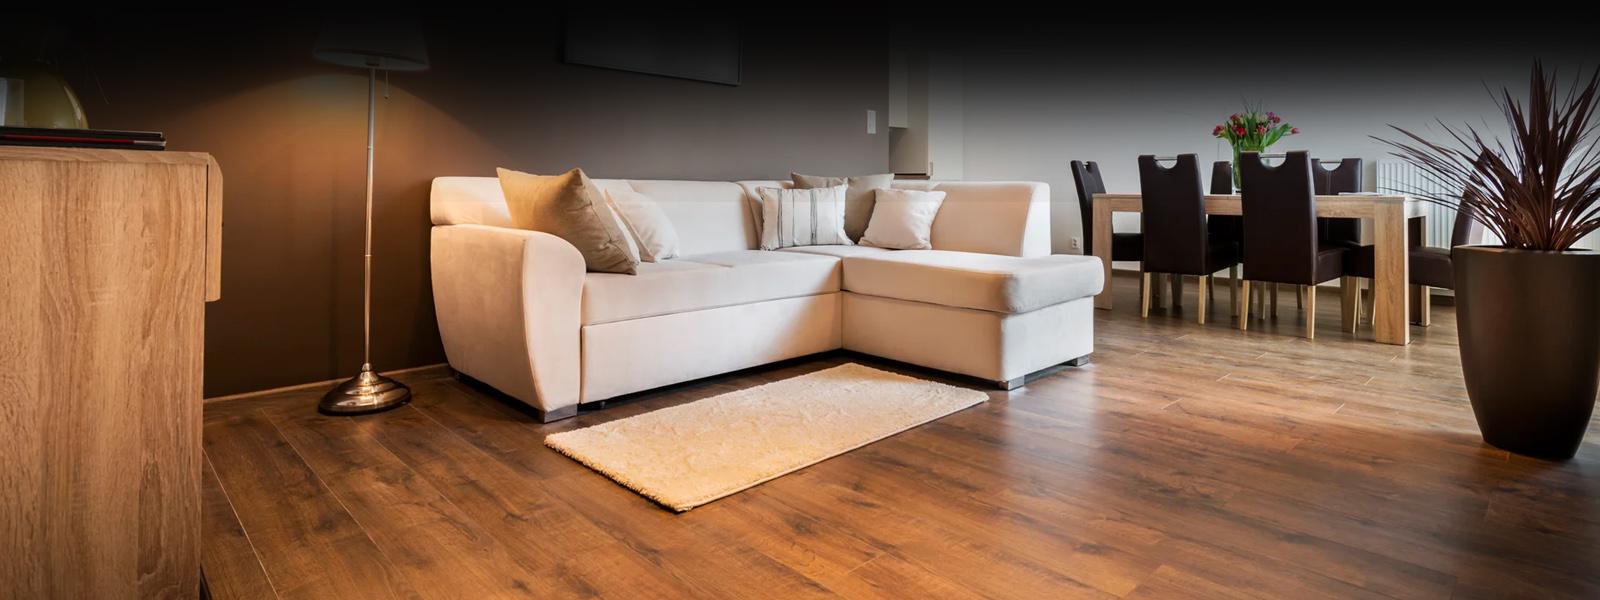 Eglinton carpets best flooring company toronto top renovation eglinton carpets dailygadgetfo Choice Image